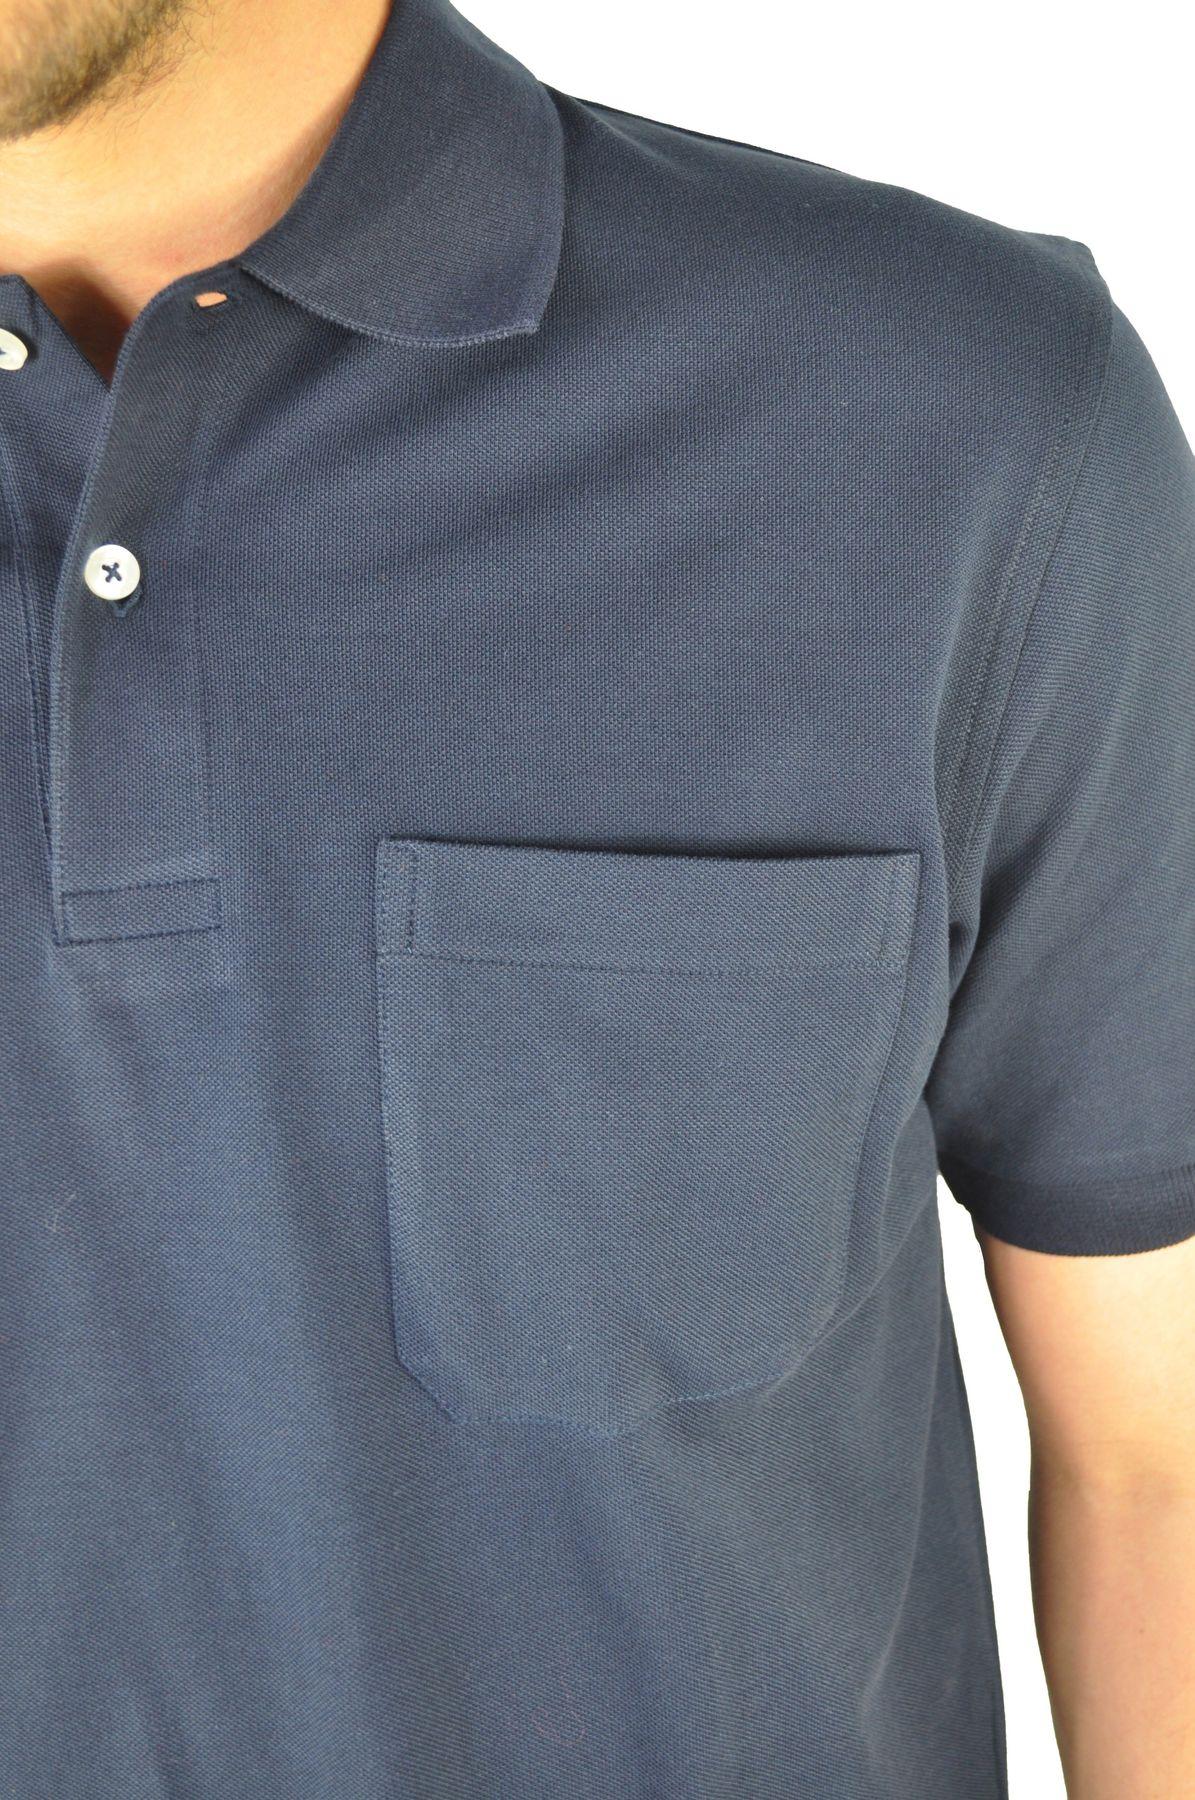 KITARO - Herren Poloshirt in verschiedenen Farben (68800) – Bild 9